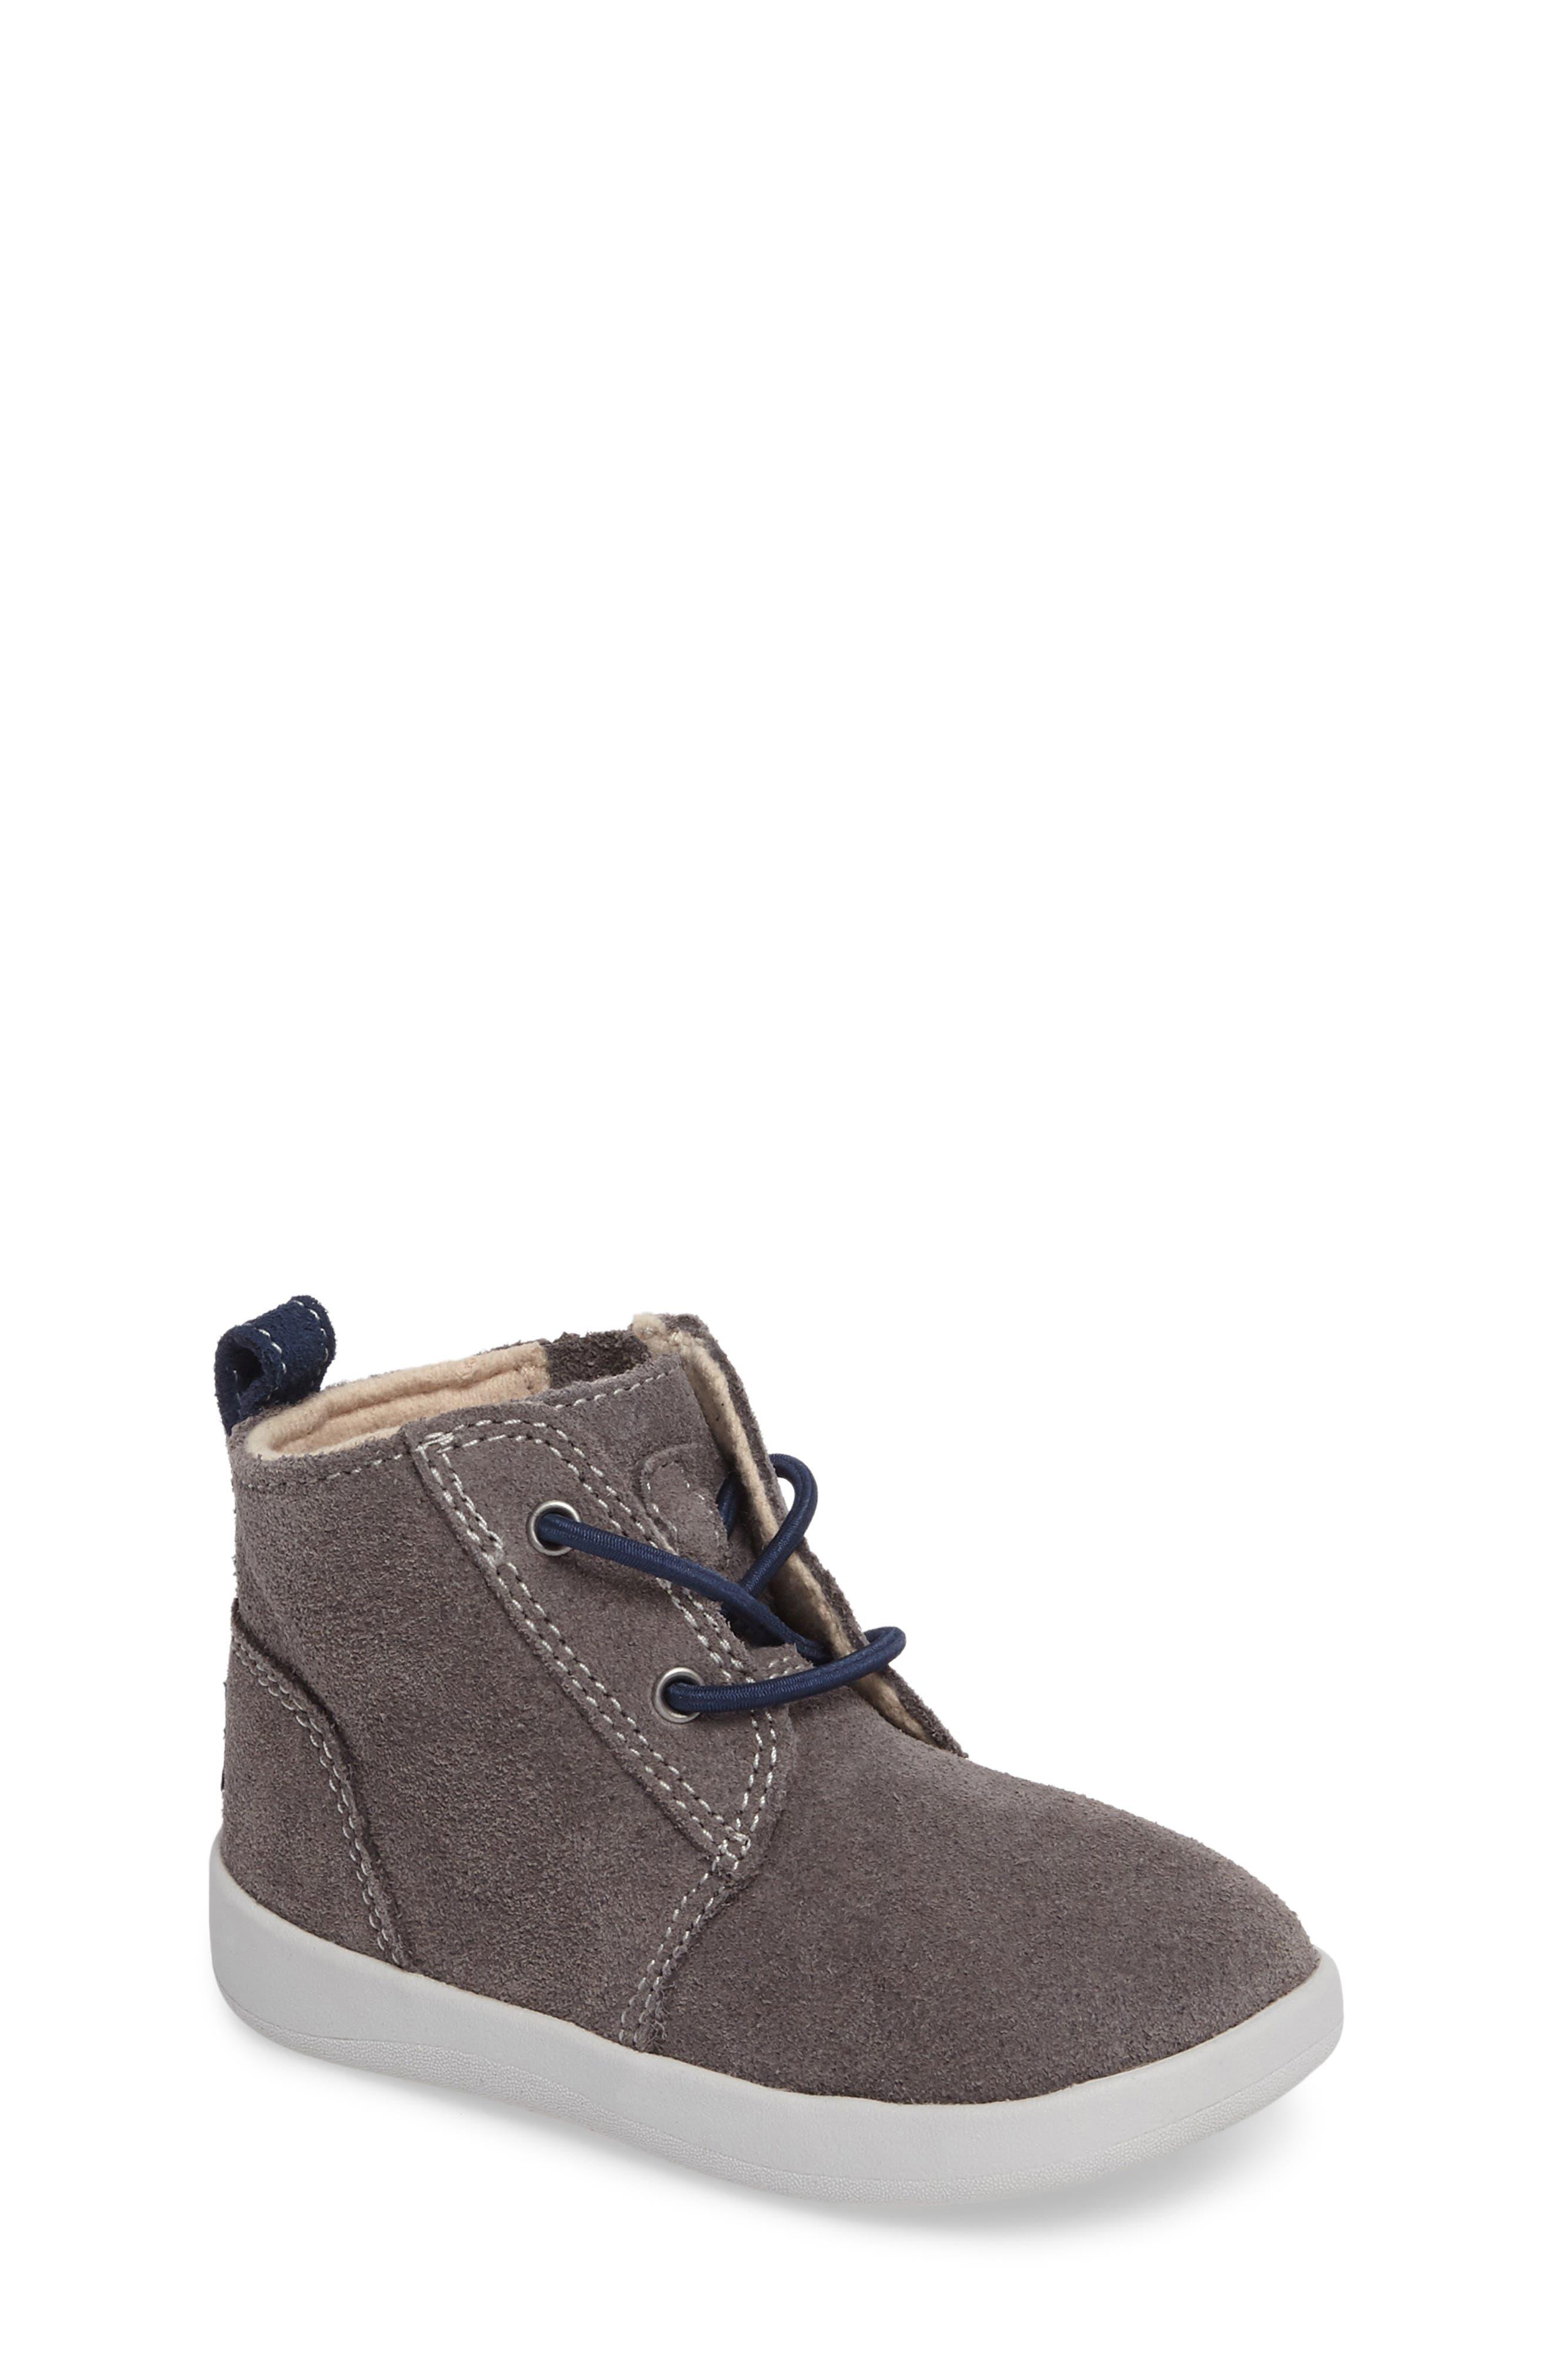 Kristjan Chukka Bootie Sneaker,                         Main,                         color, Charcoal